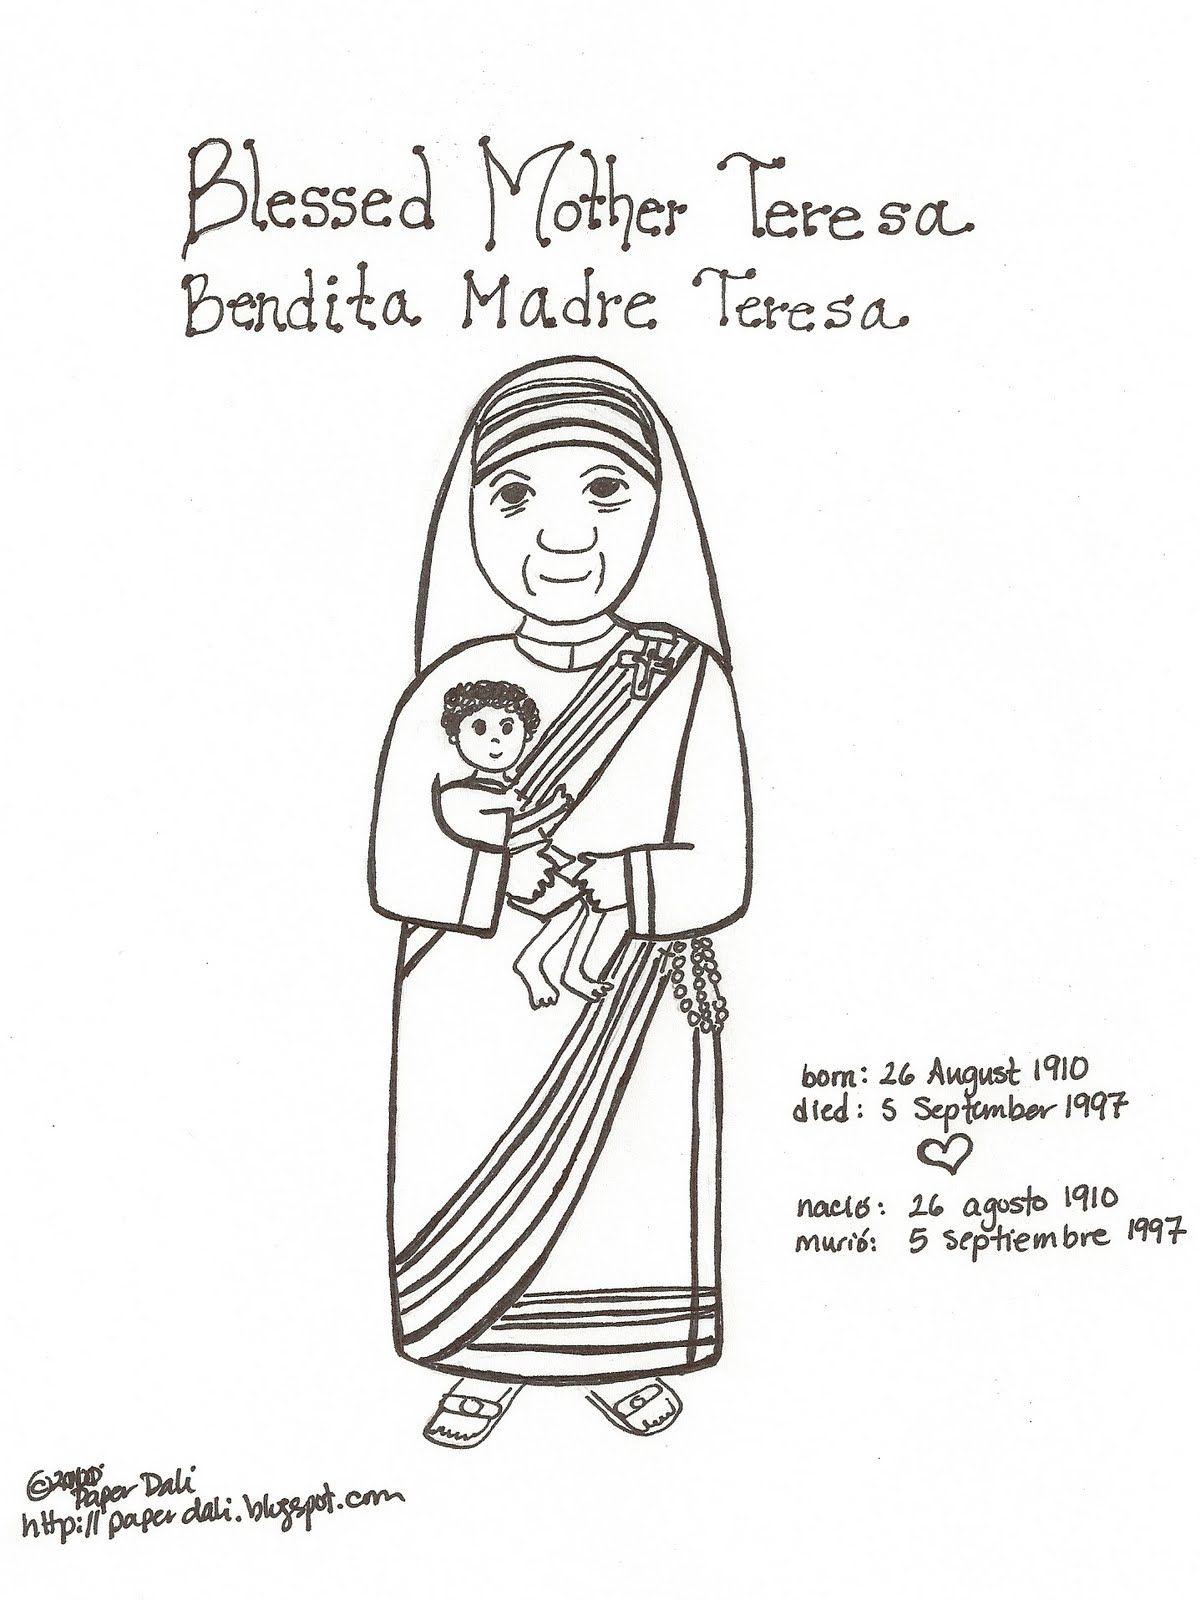 Paper Dali Blessed Mother Teresa Of Calcutta Bendita